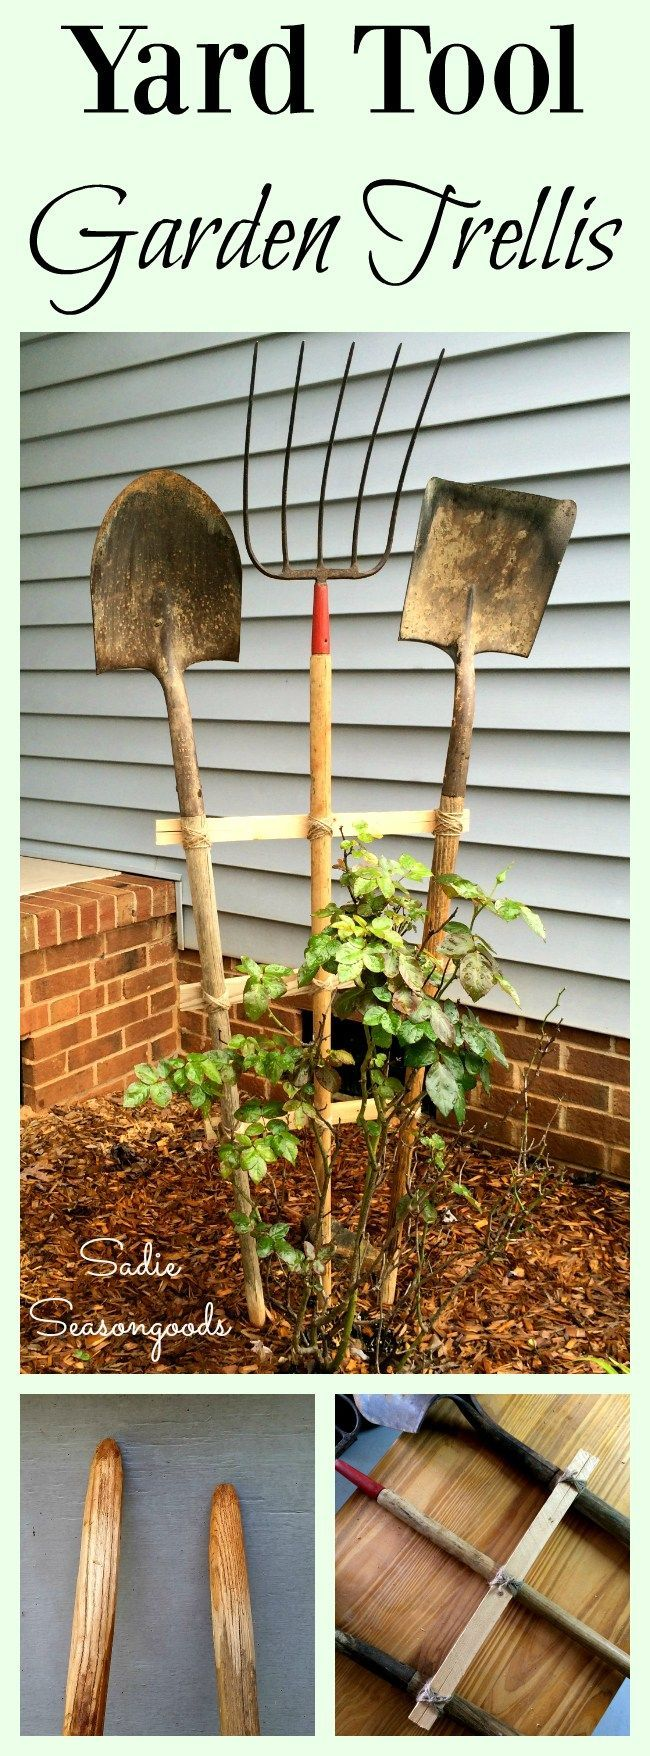 DIY Garden Trellis using Repurposed Vintage Yard Tools Betty Hodges Adcock